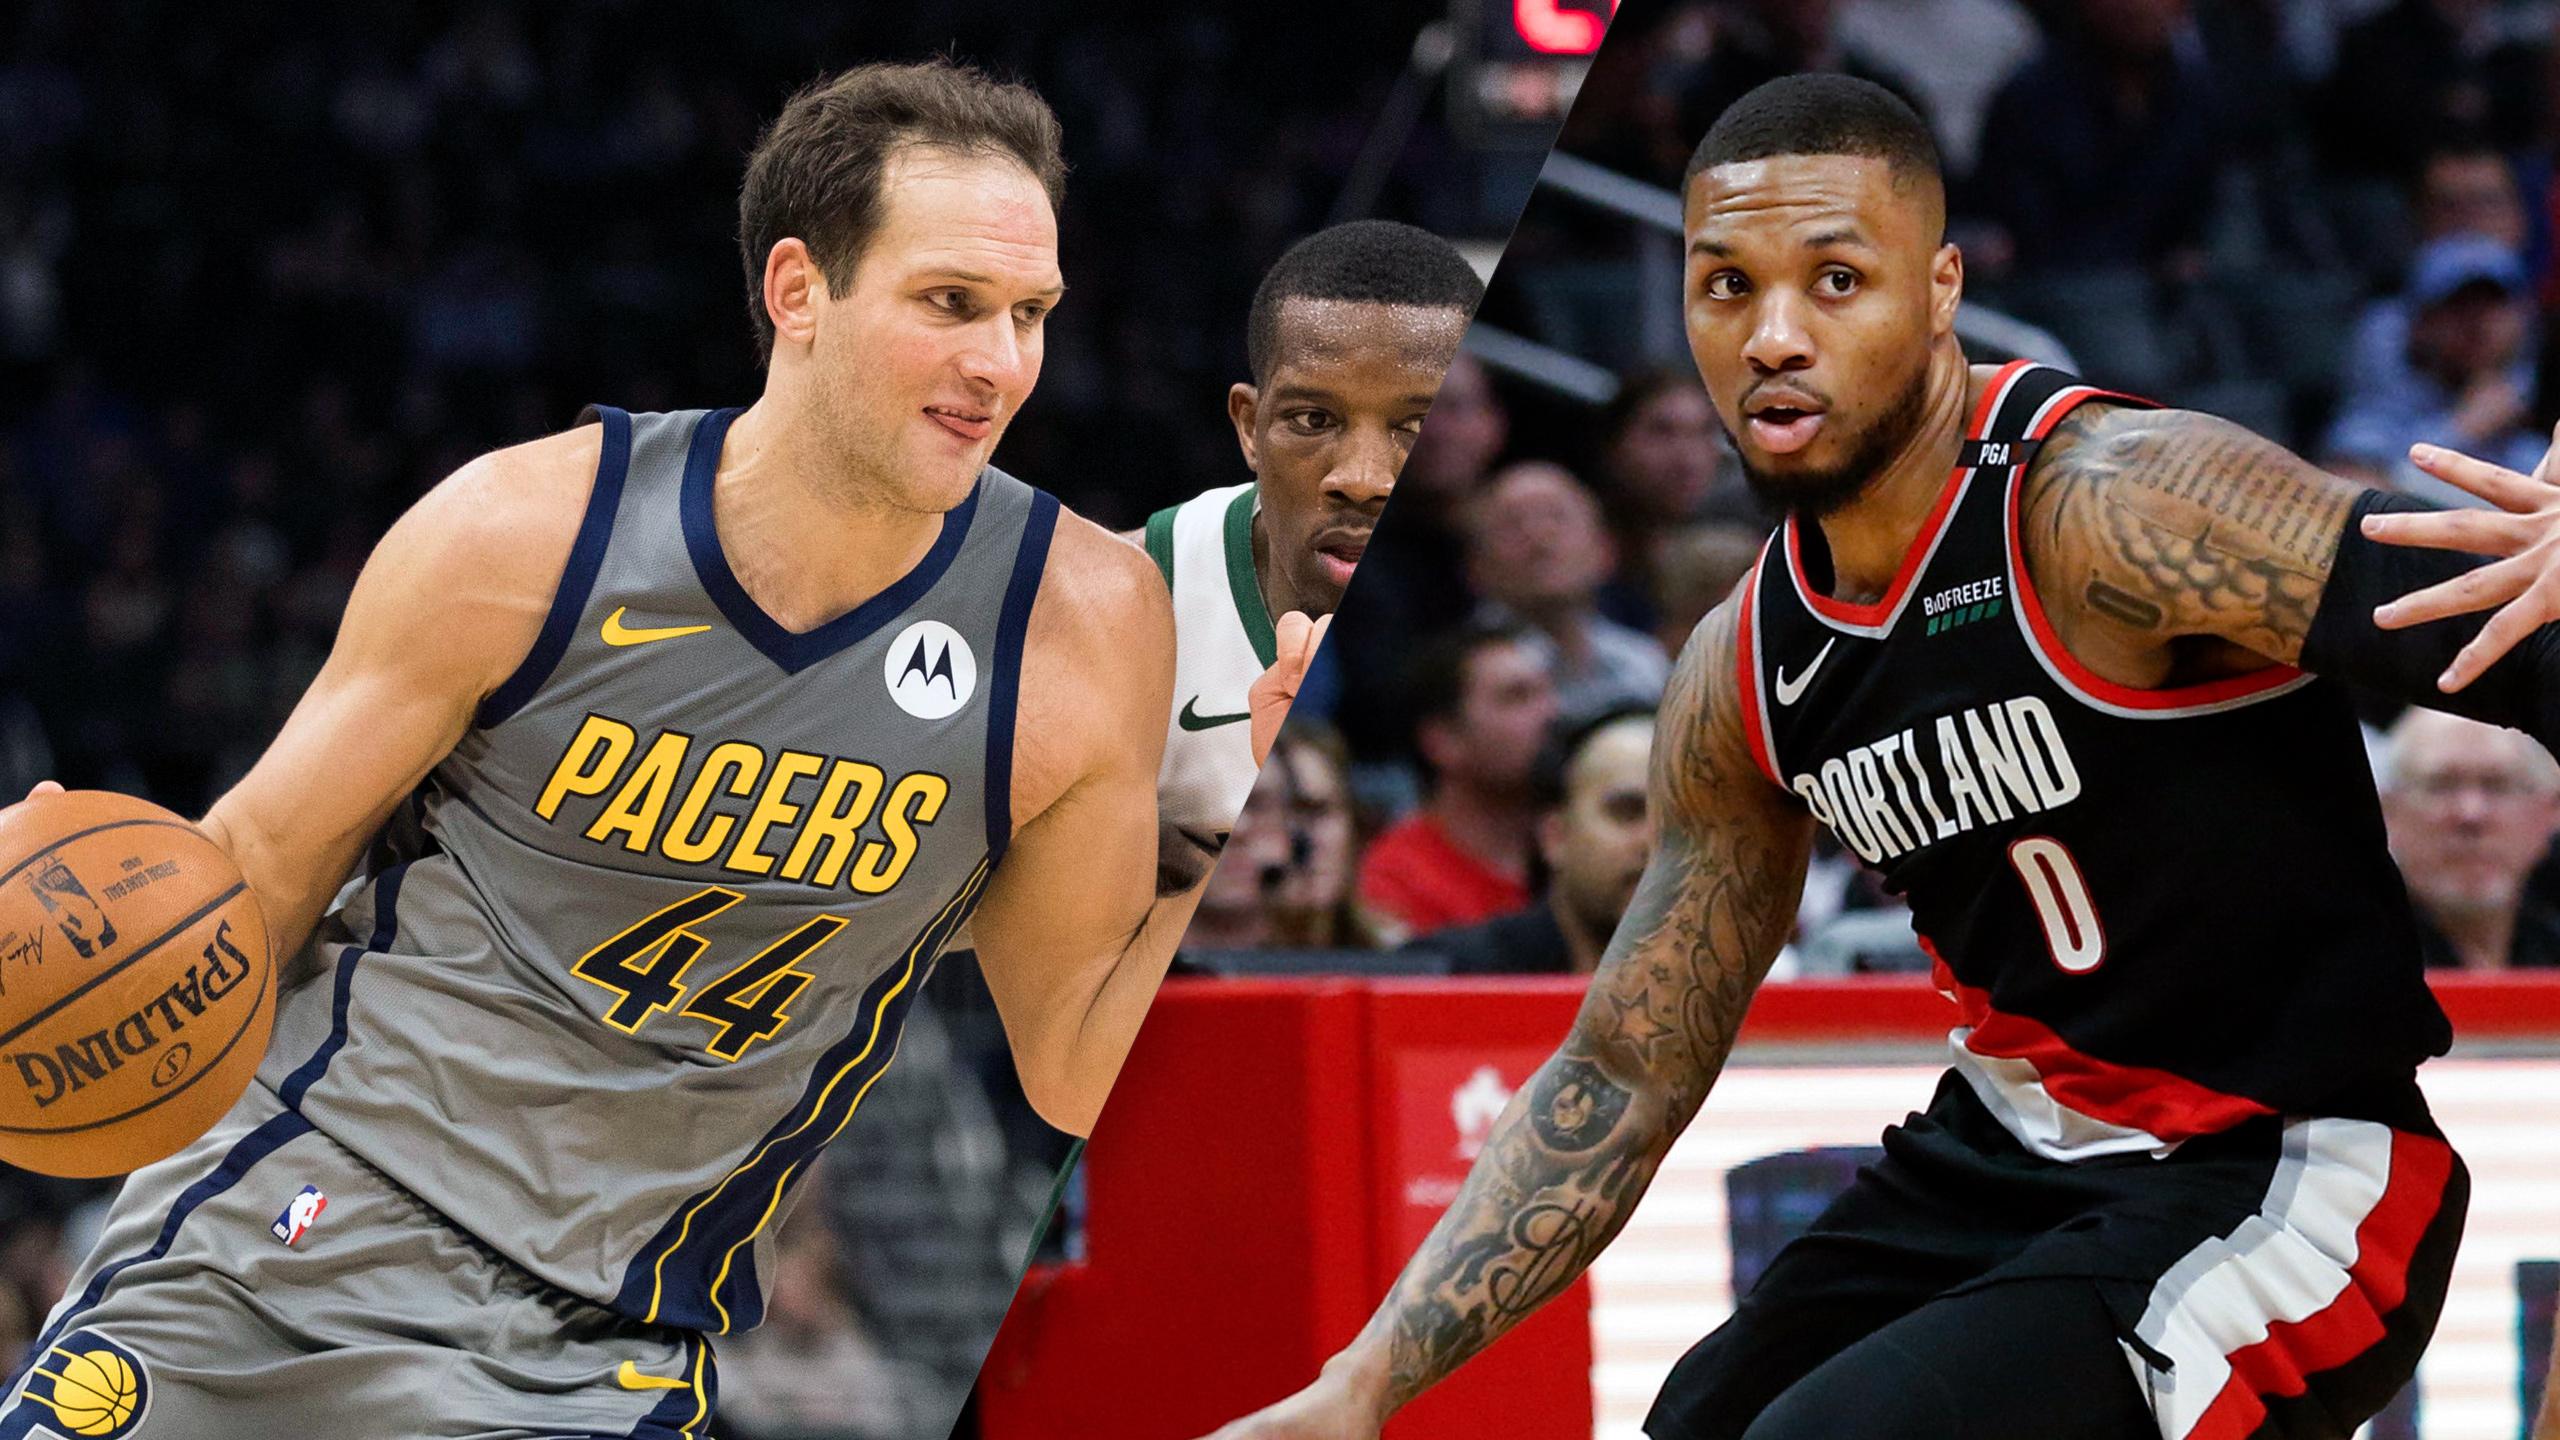 Indiana Pacers vs. Portland Trail Blazers